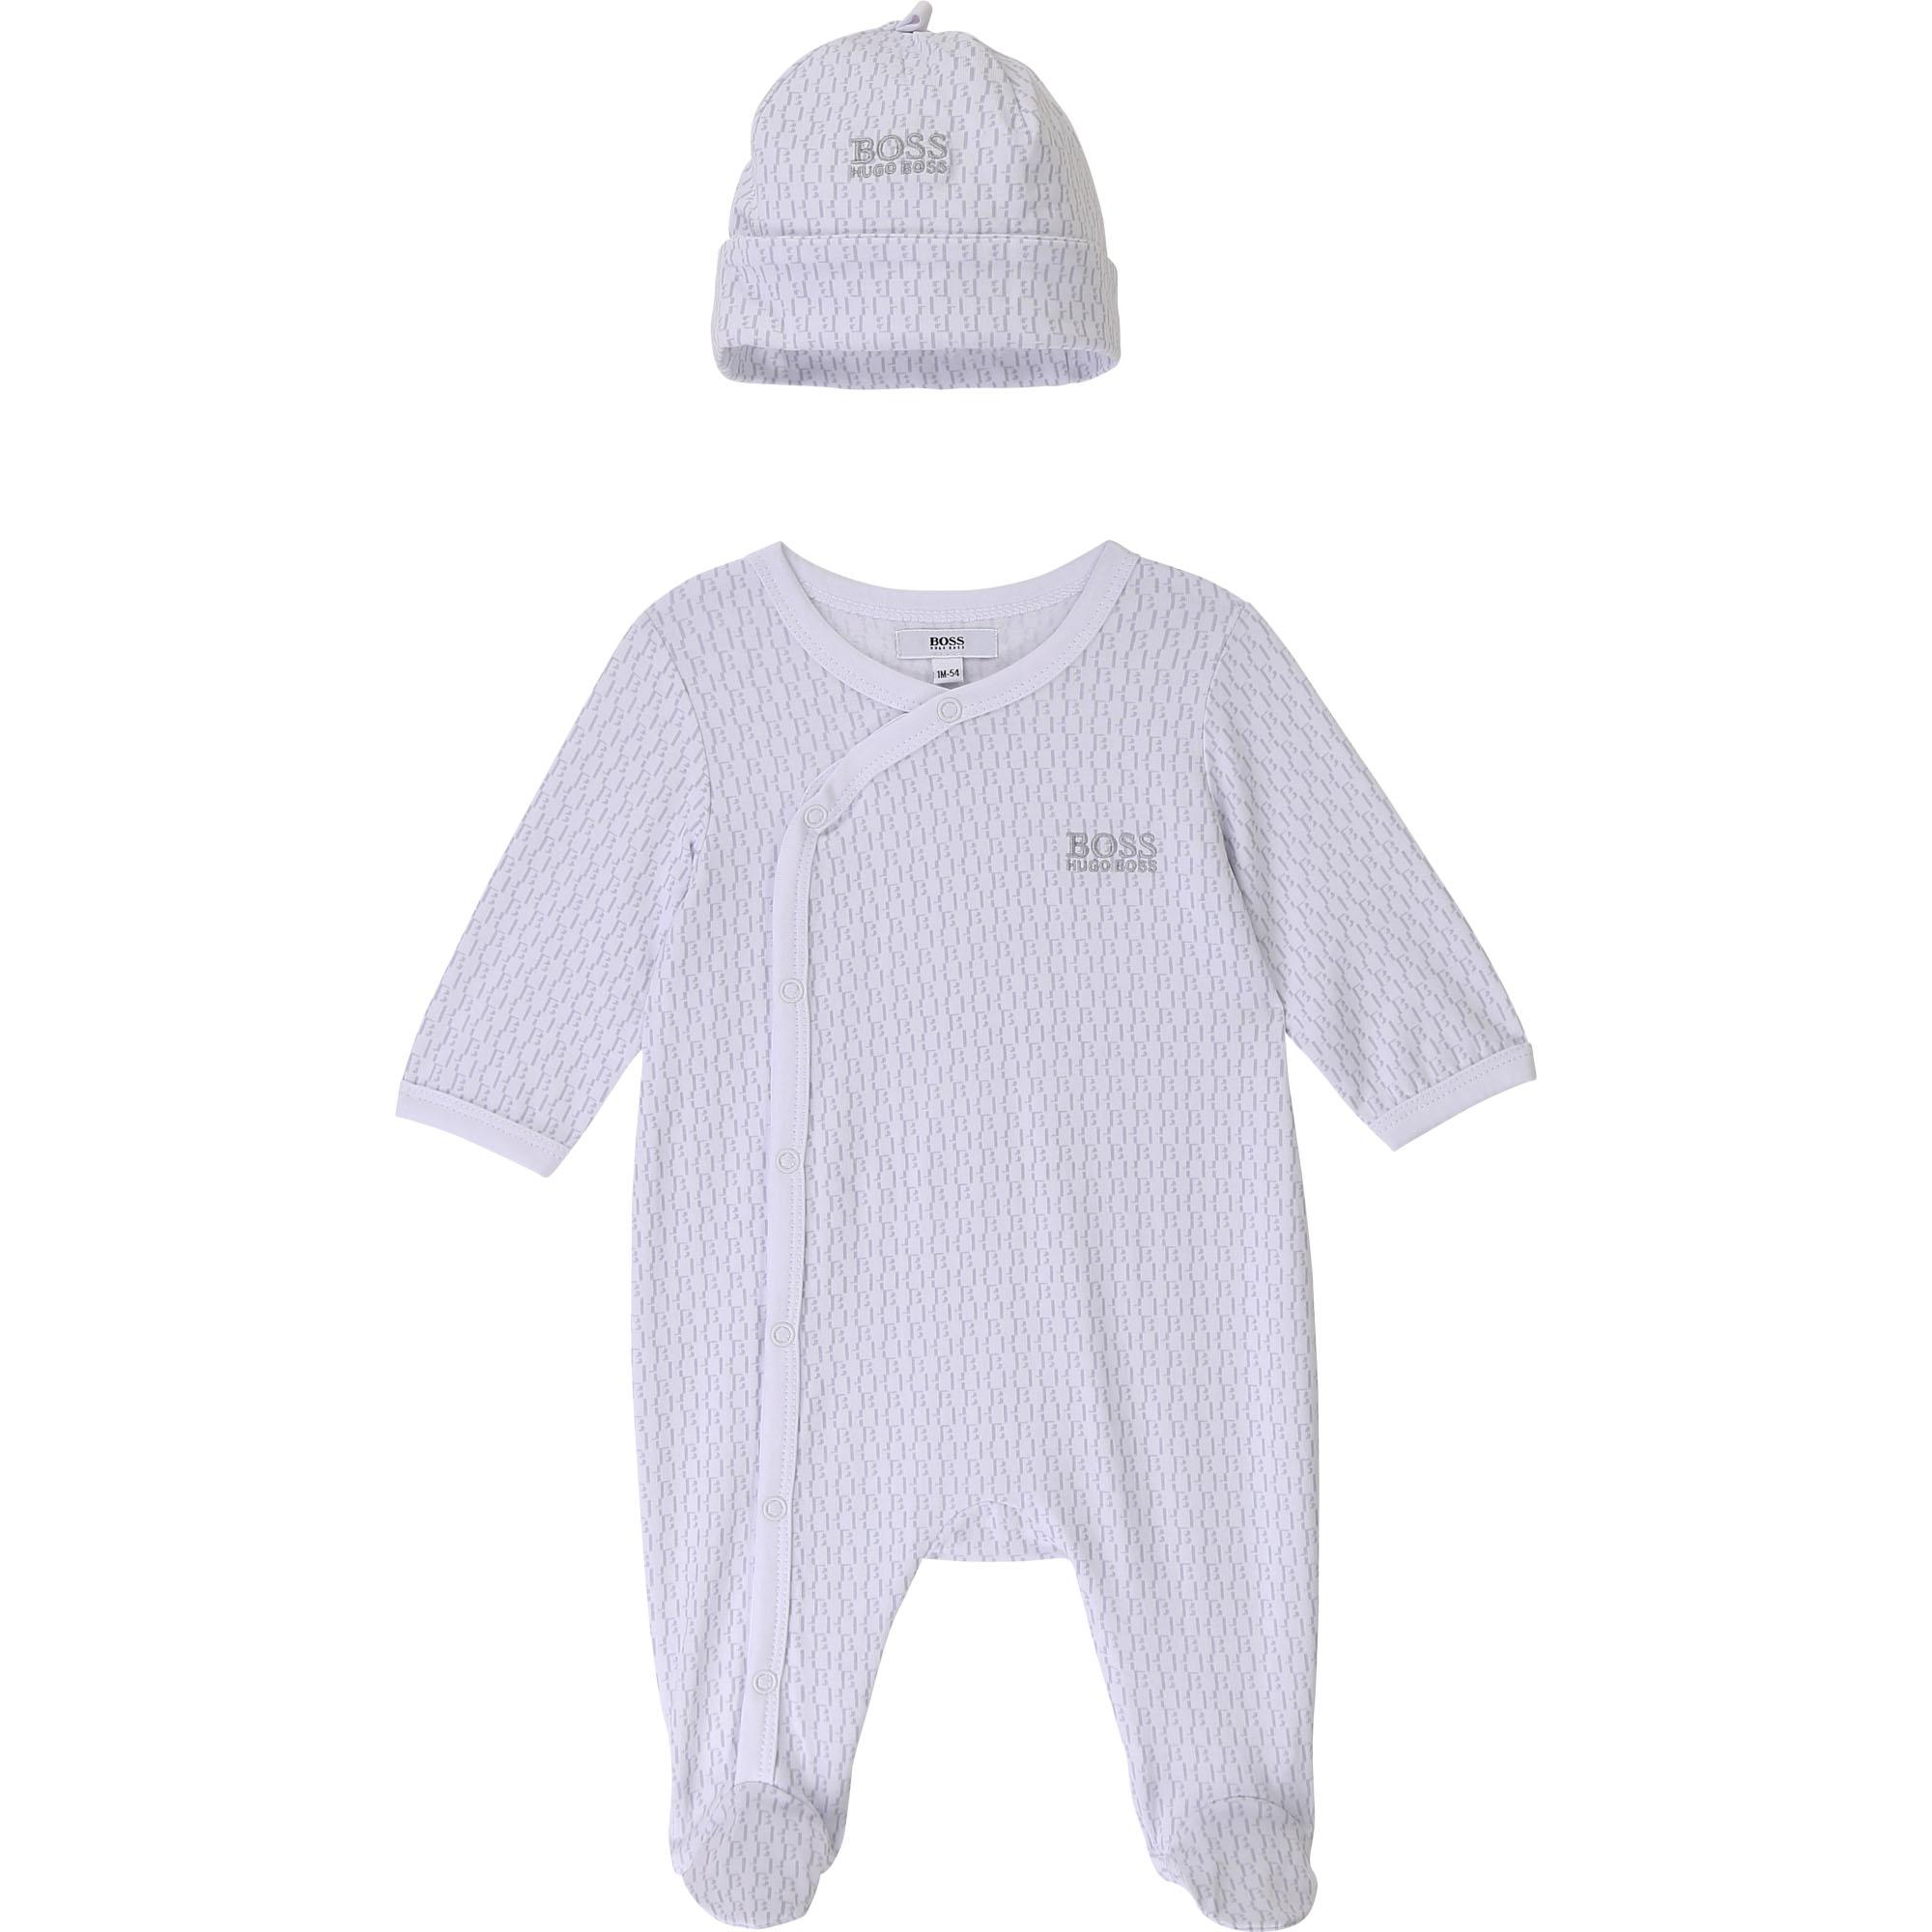 Ensemble pyjama bonnet jersey BOSS pour UNISEXE